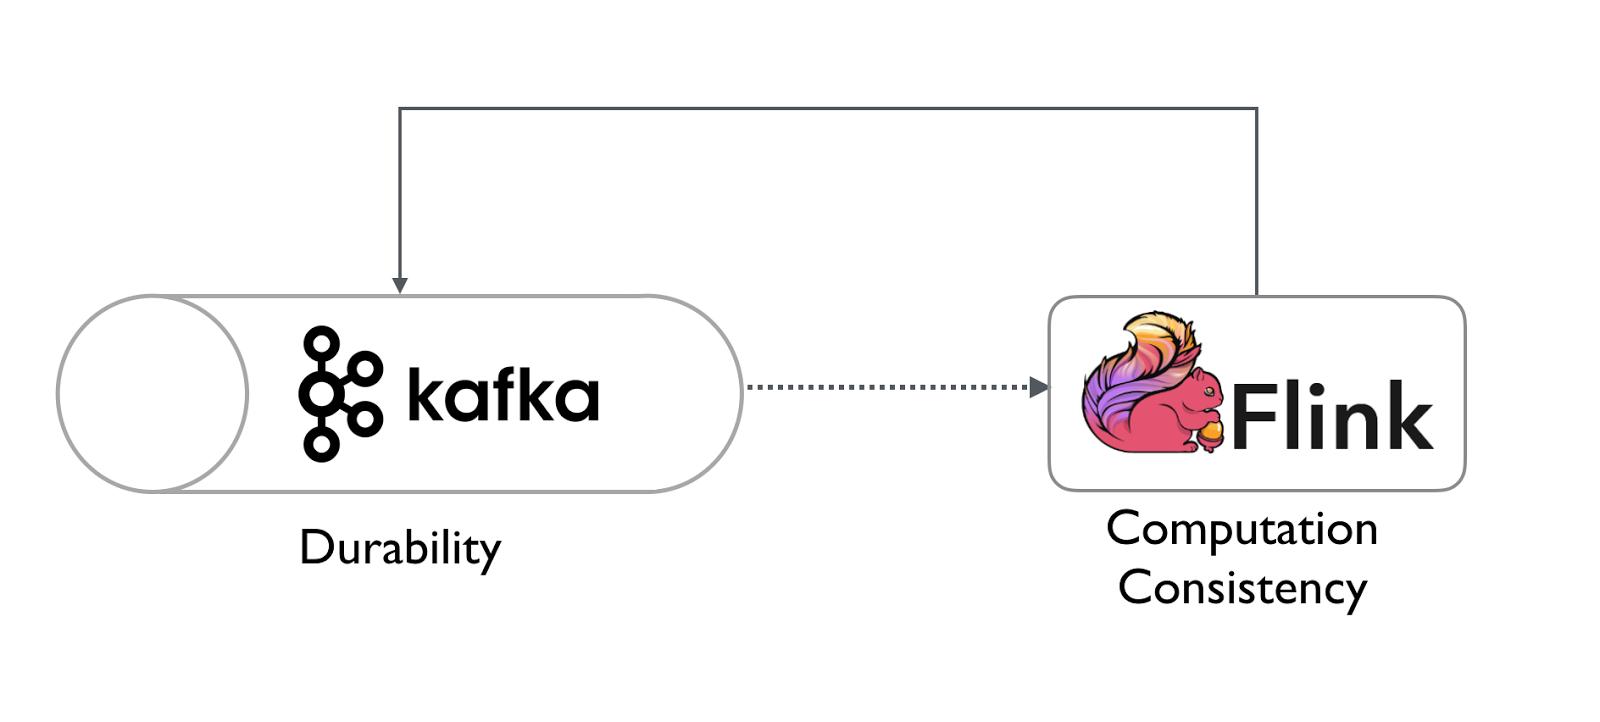 Tug's Blog: Getting started with Apache Flink and Kafka